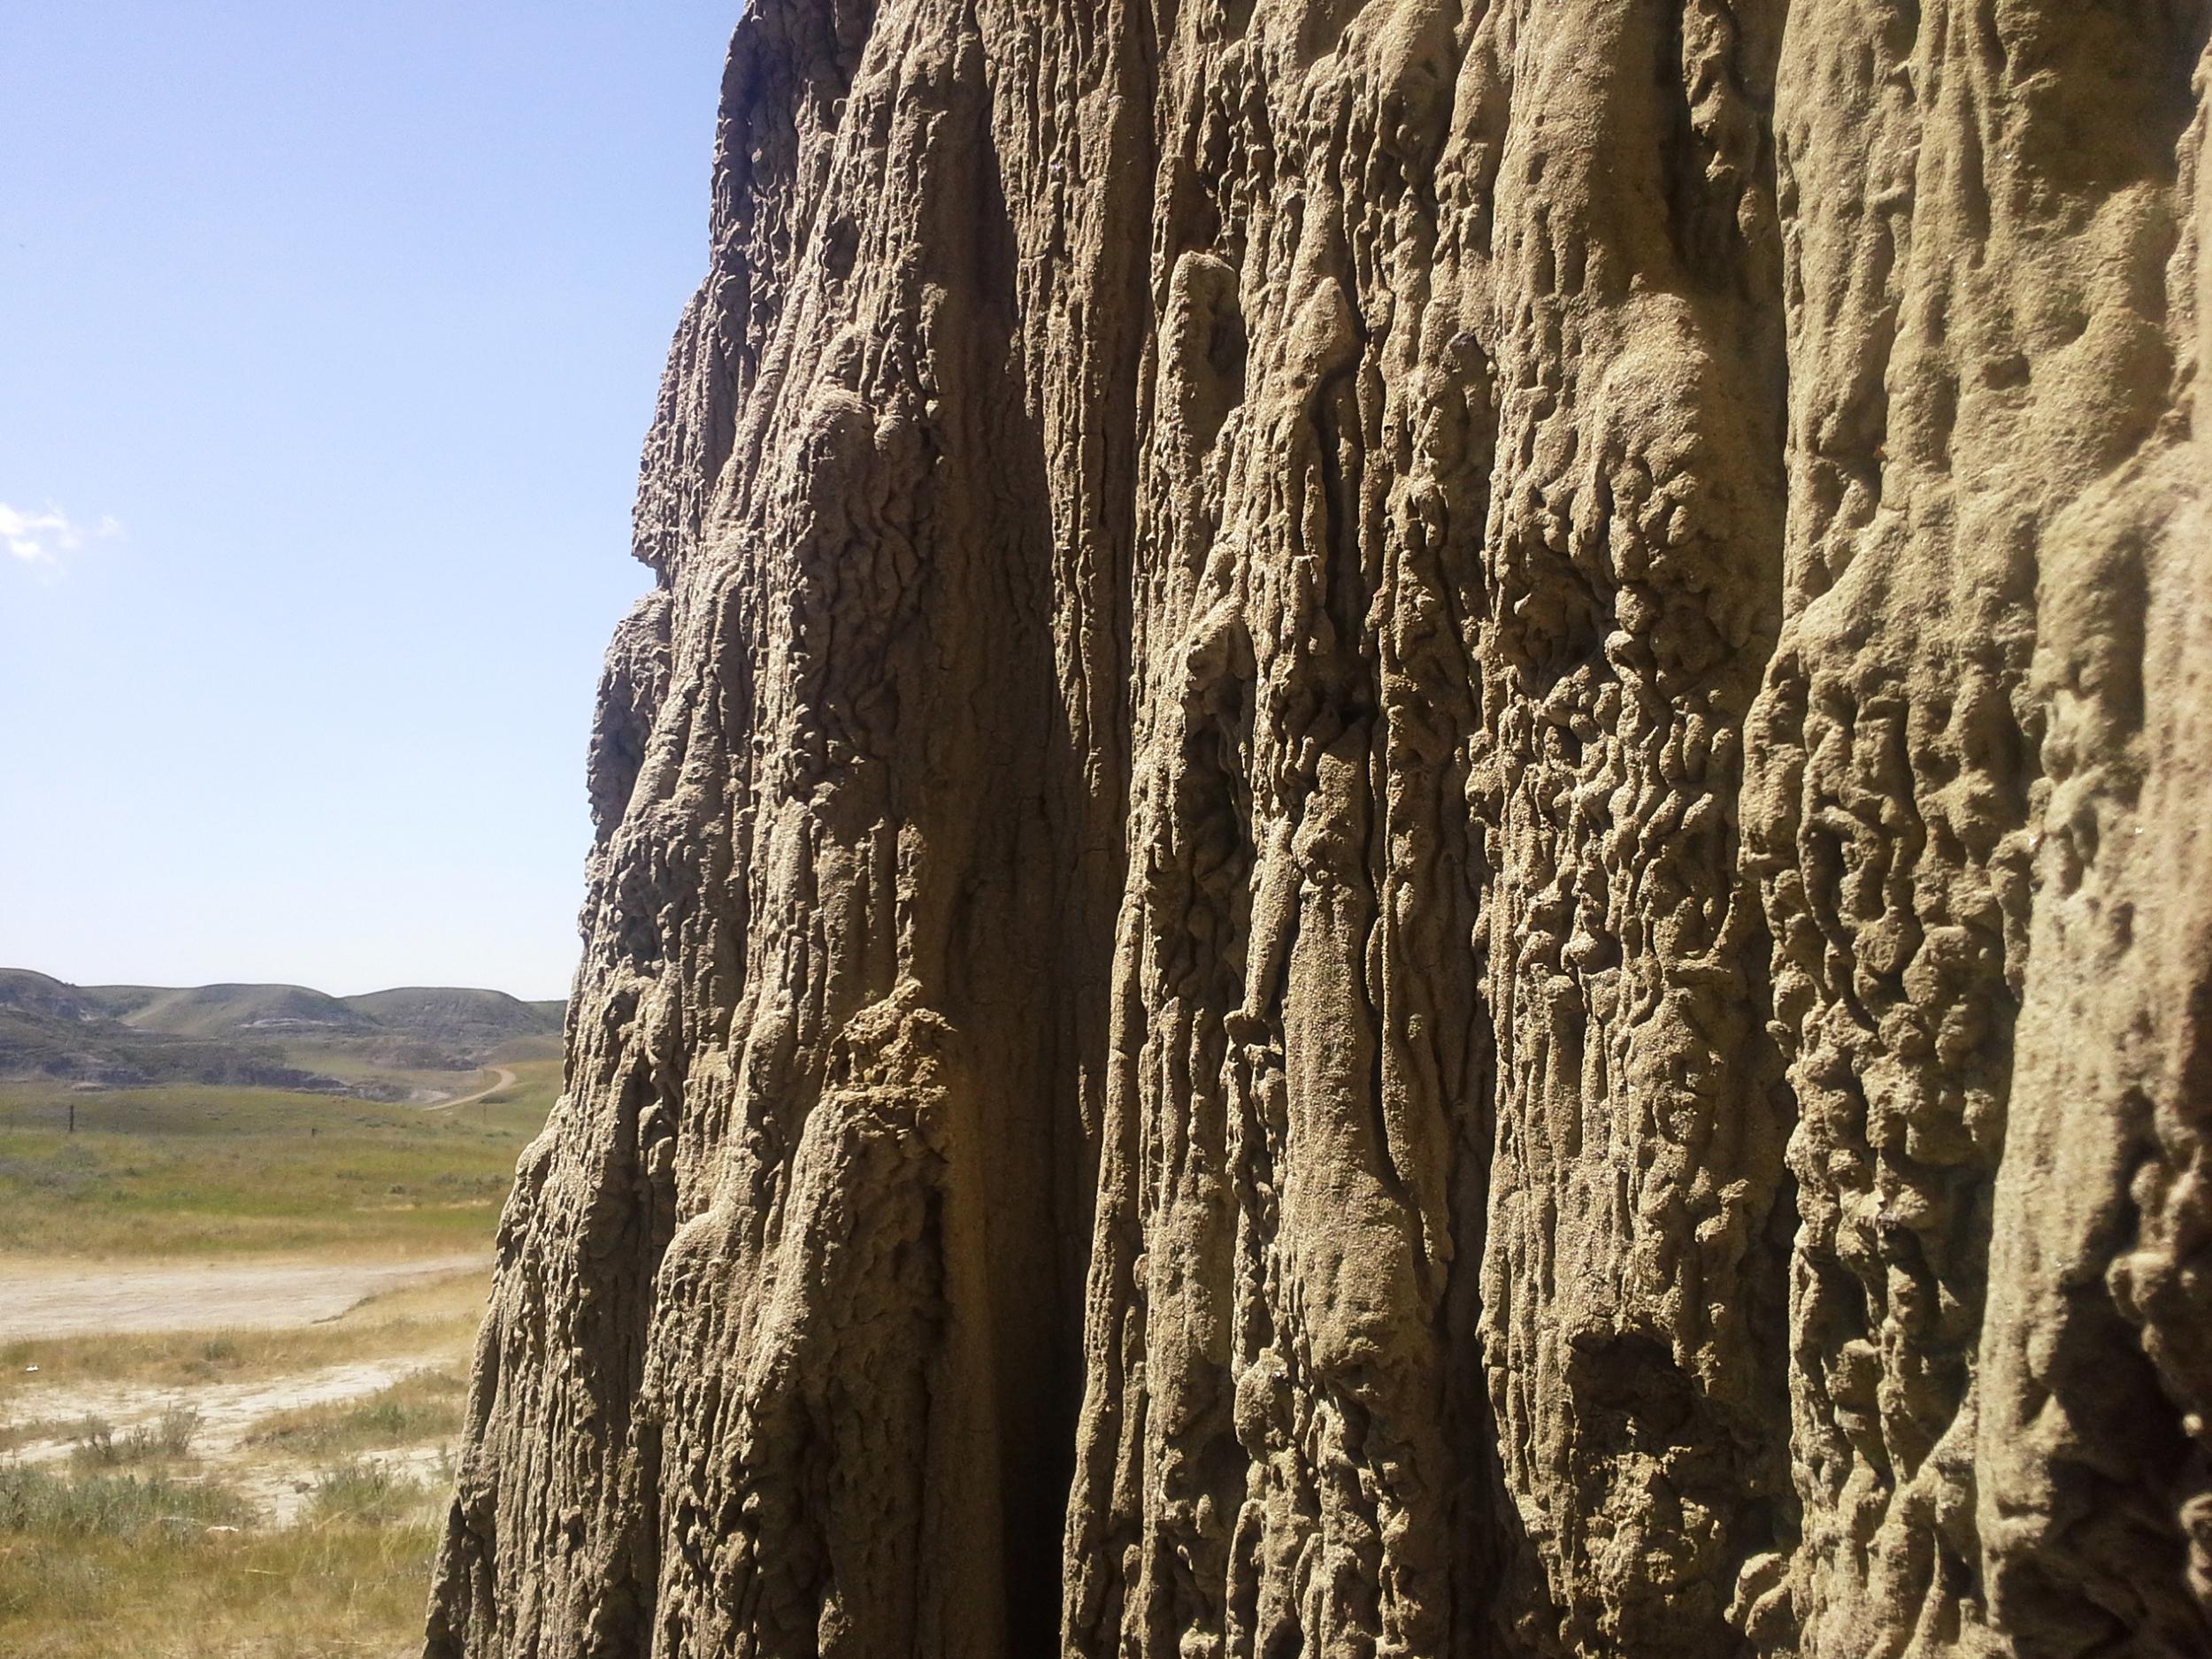 Sandstone Walls of Castle Butte